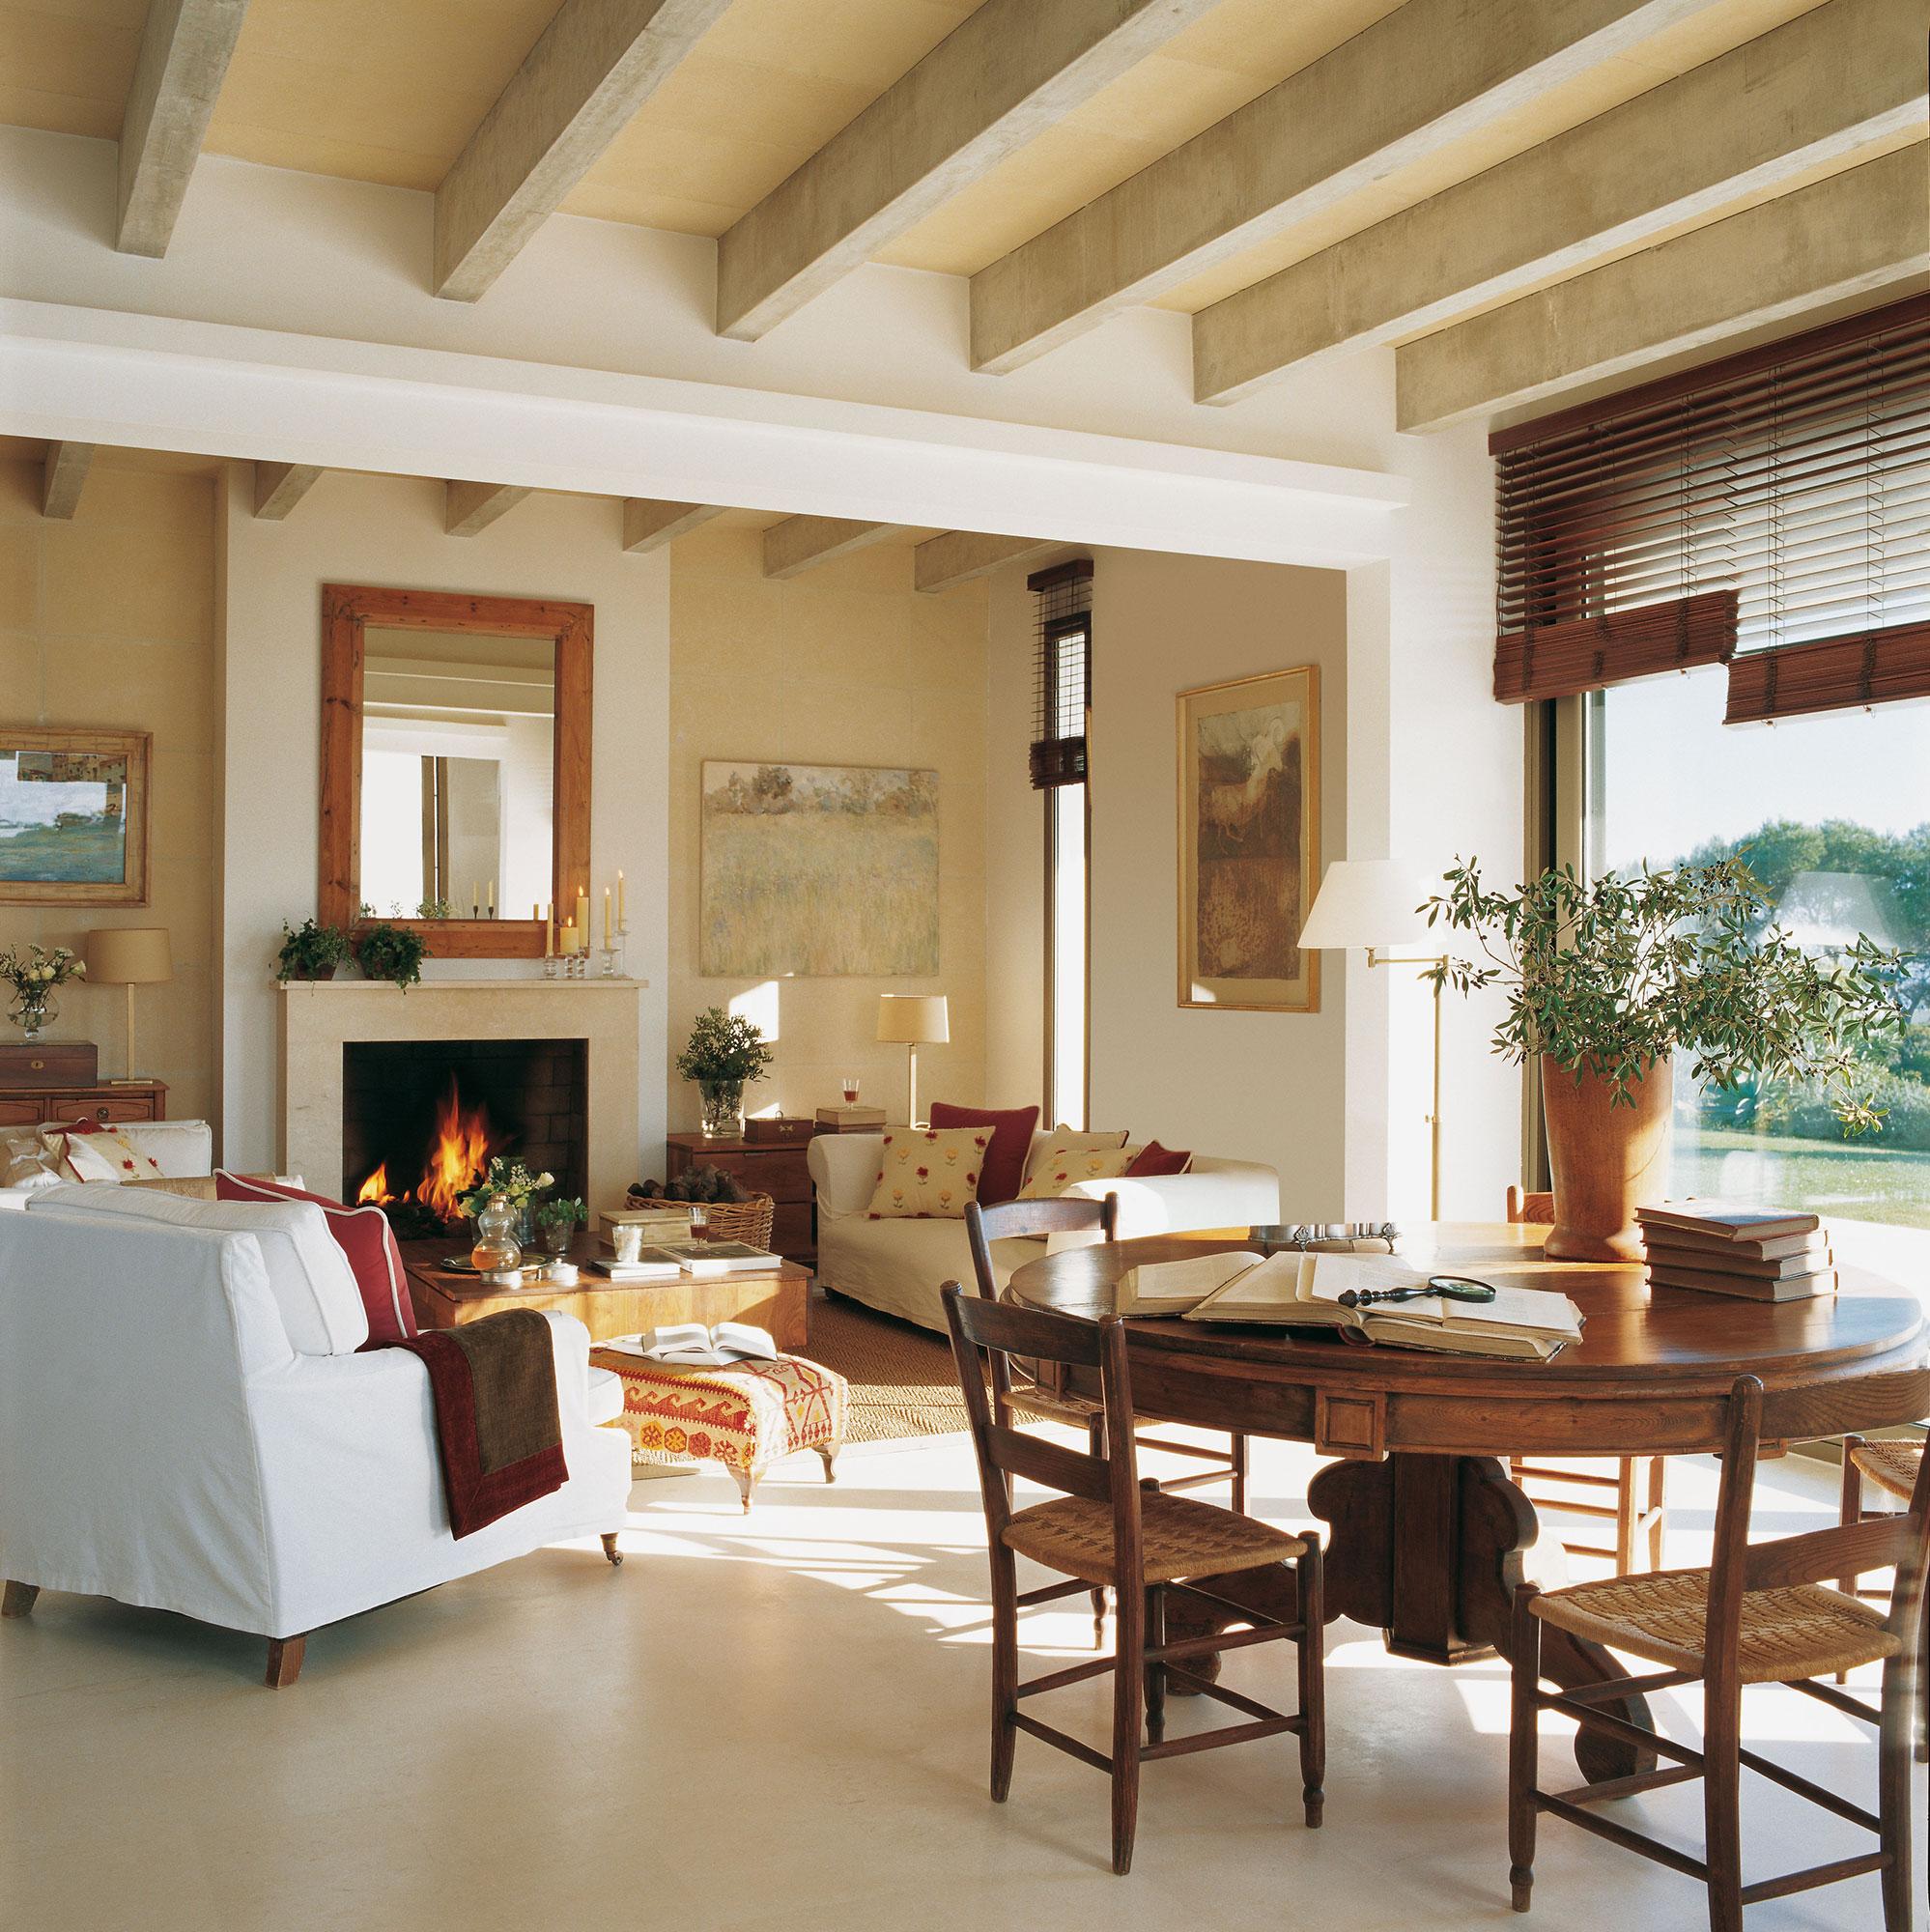 Salones con chimeneas modernas interesting chimeneas - Salones con chimenea ...